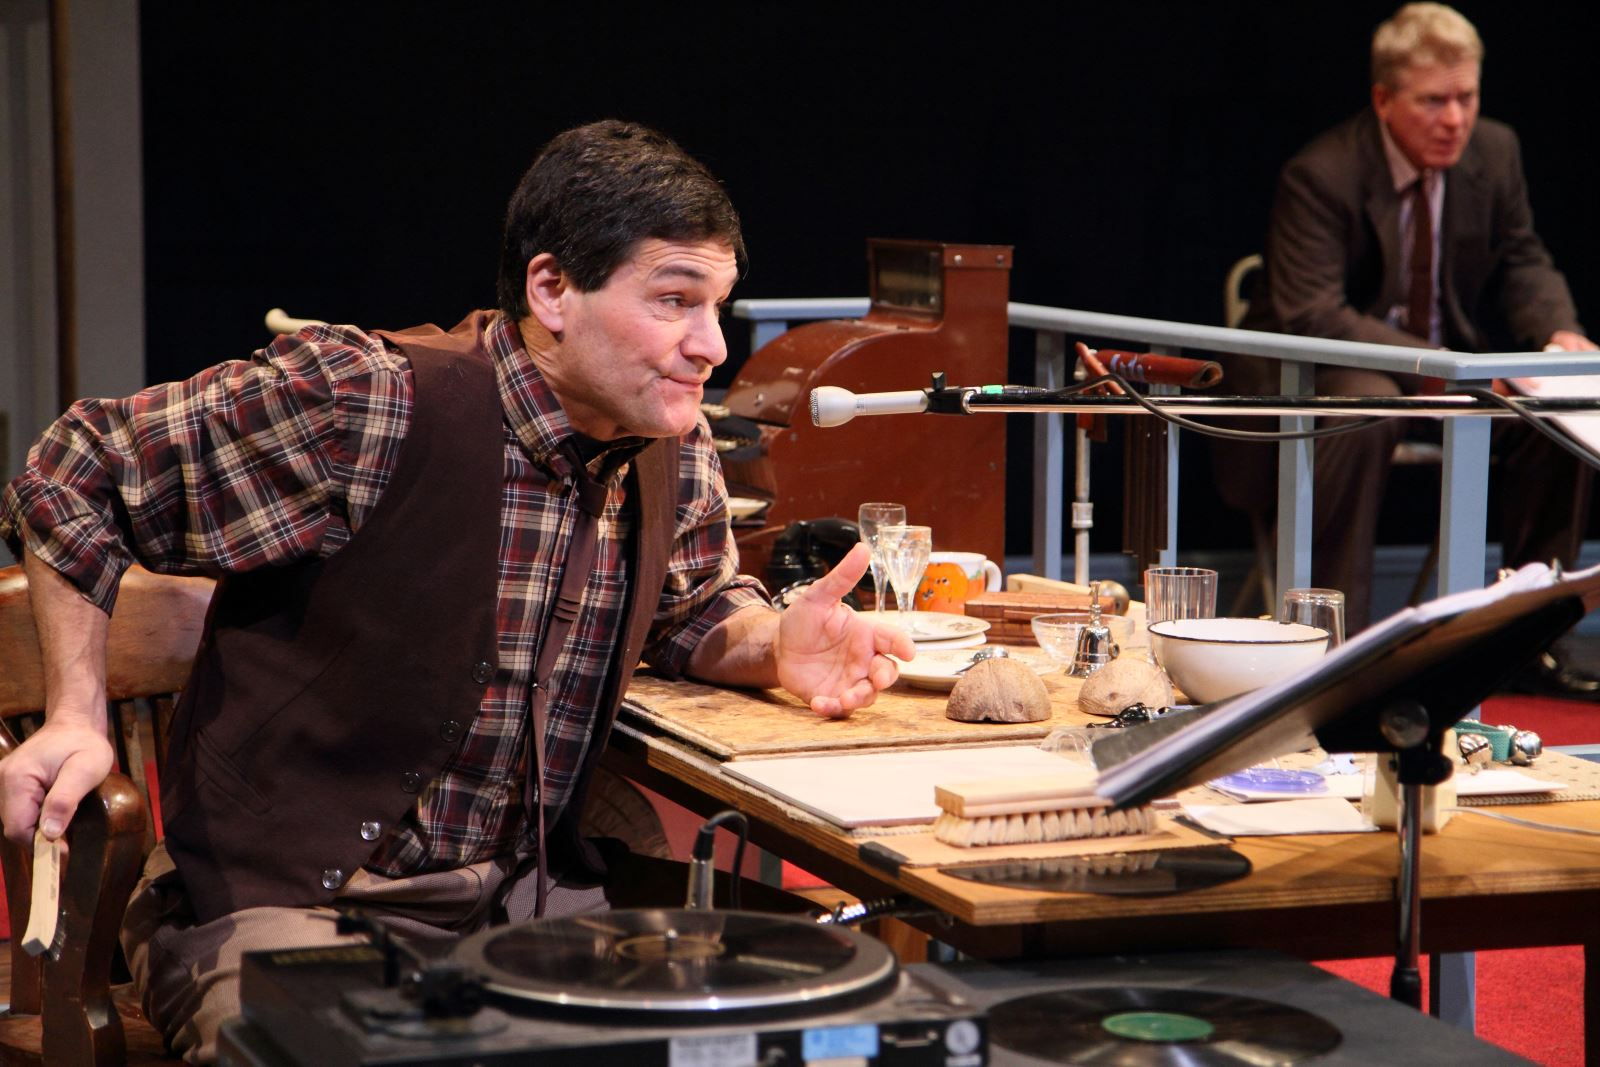 Artistic Director David Cecsarini as Foley artist